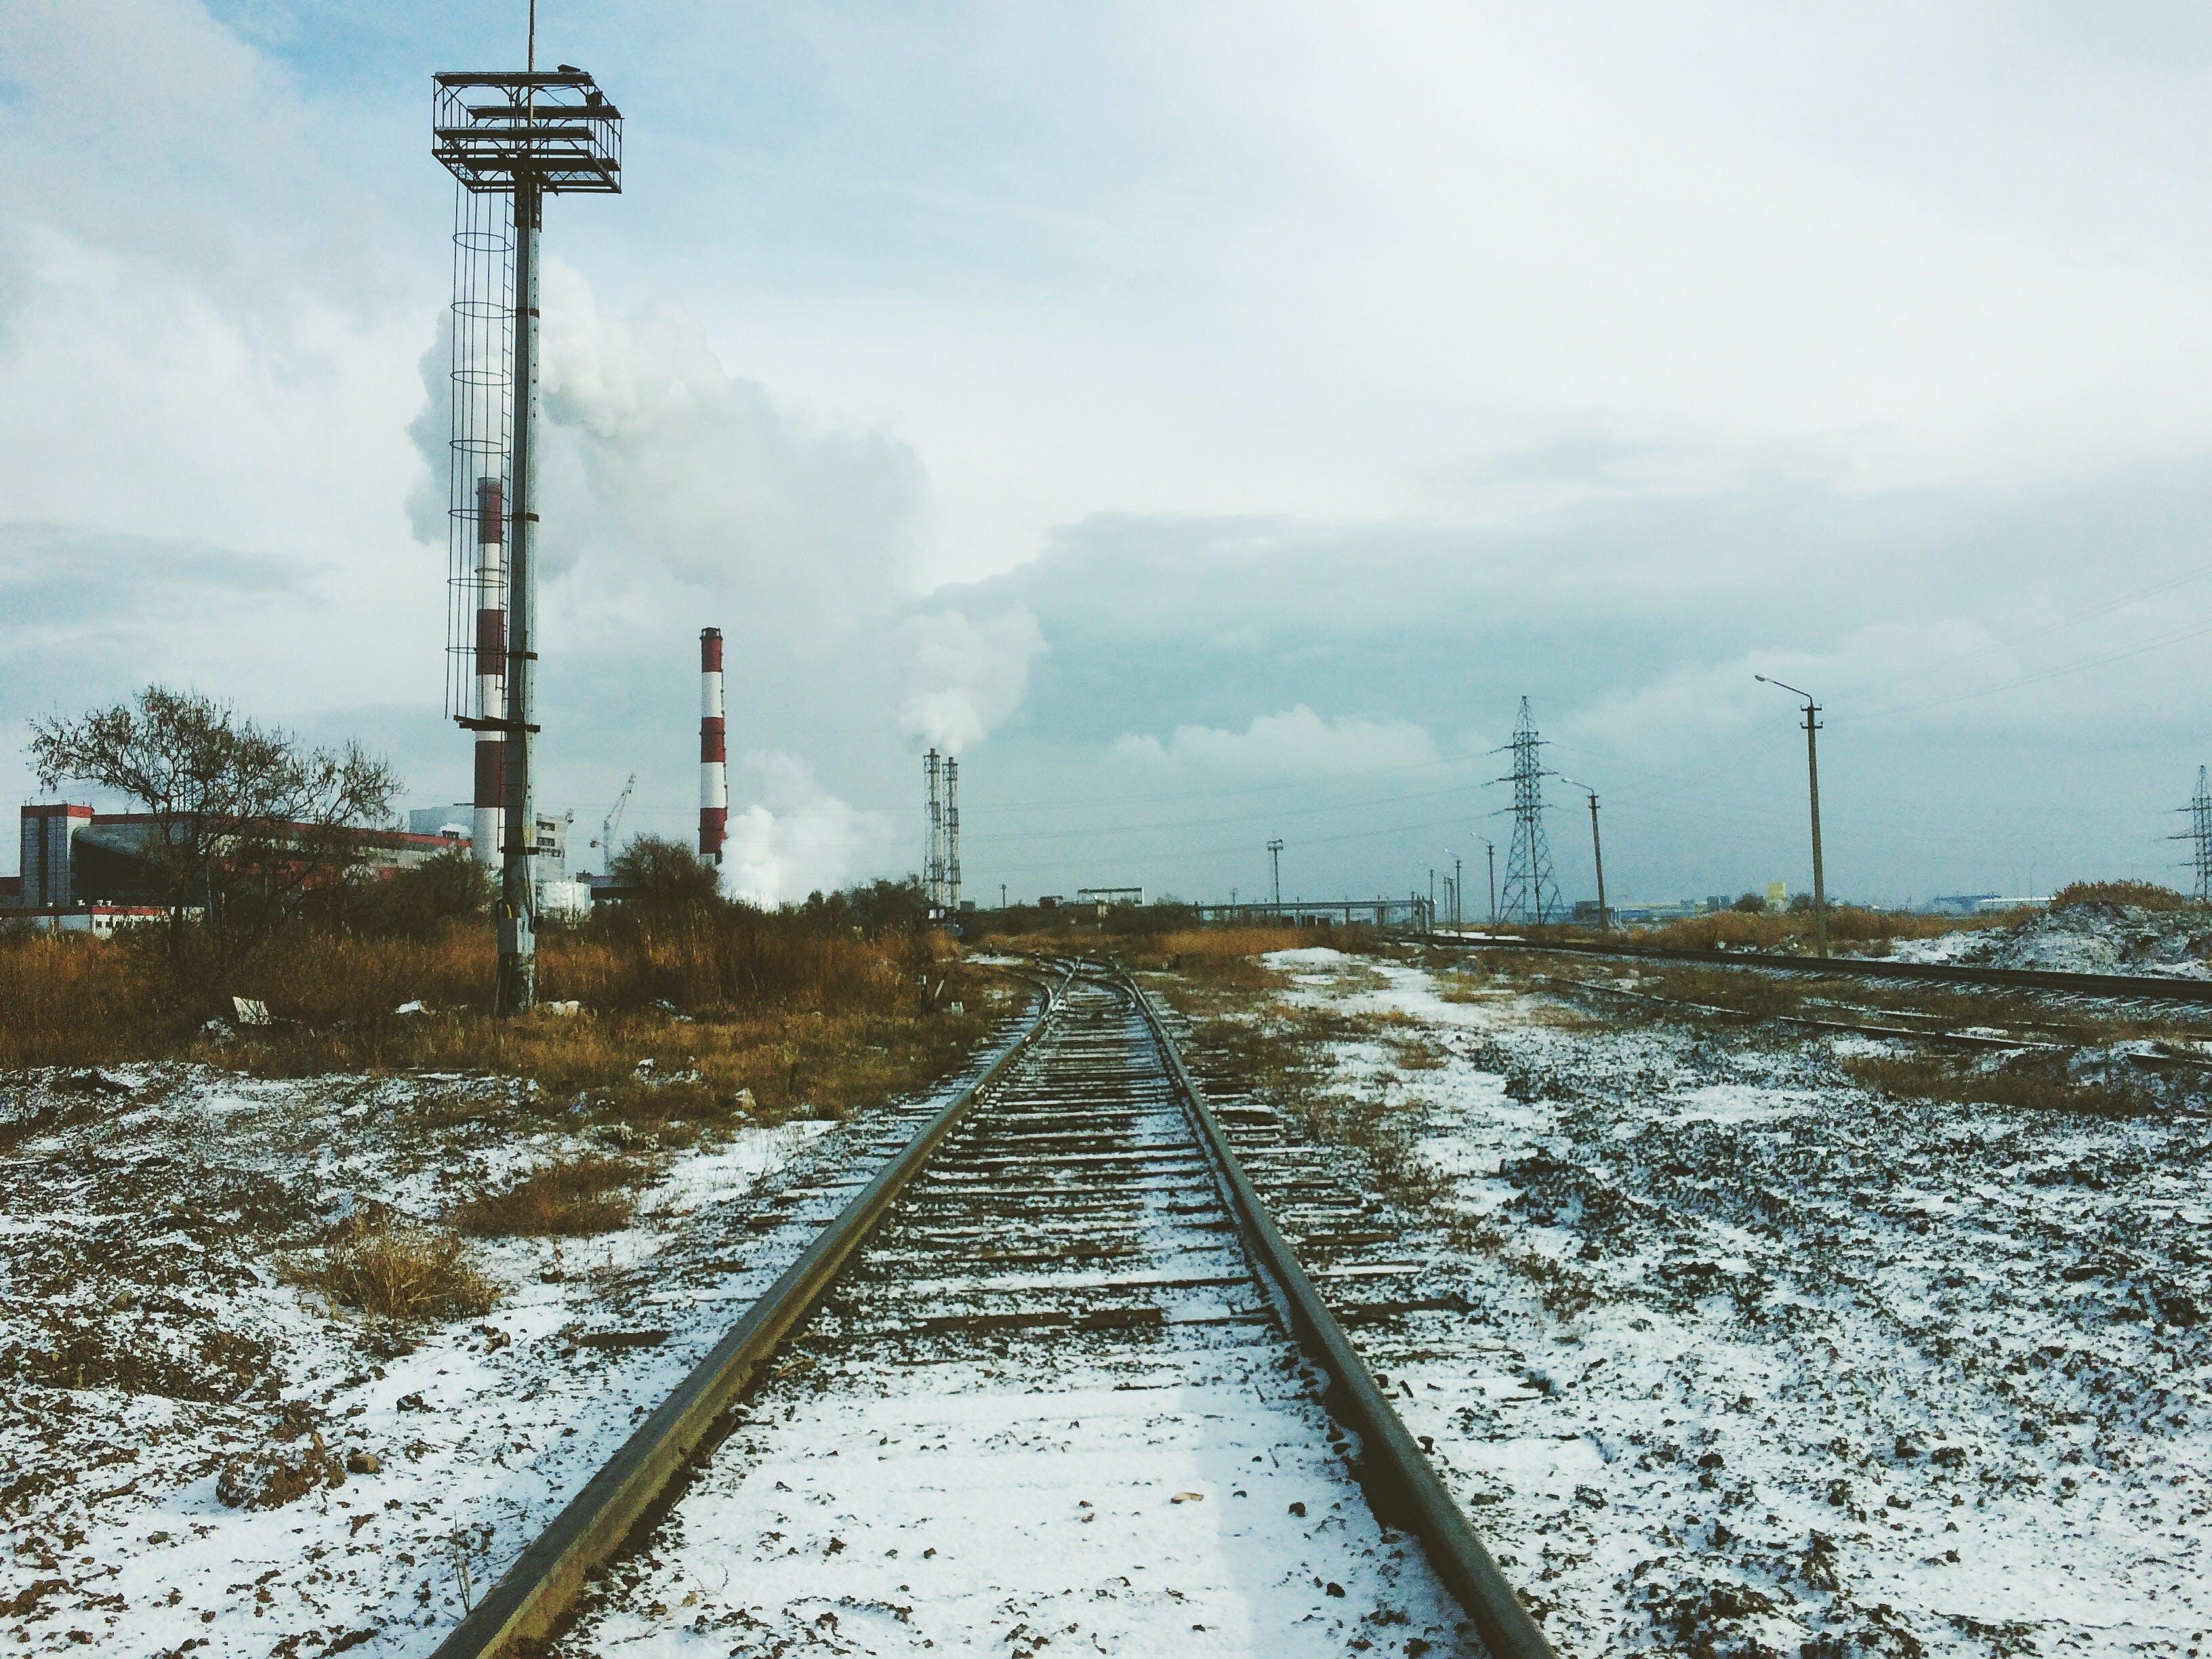 Landscape Photography of Train Rail